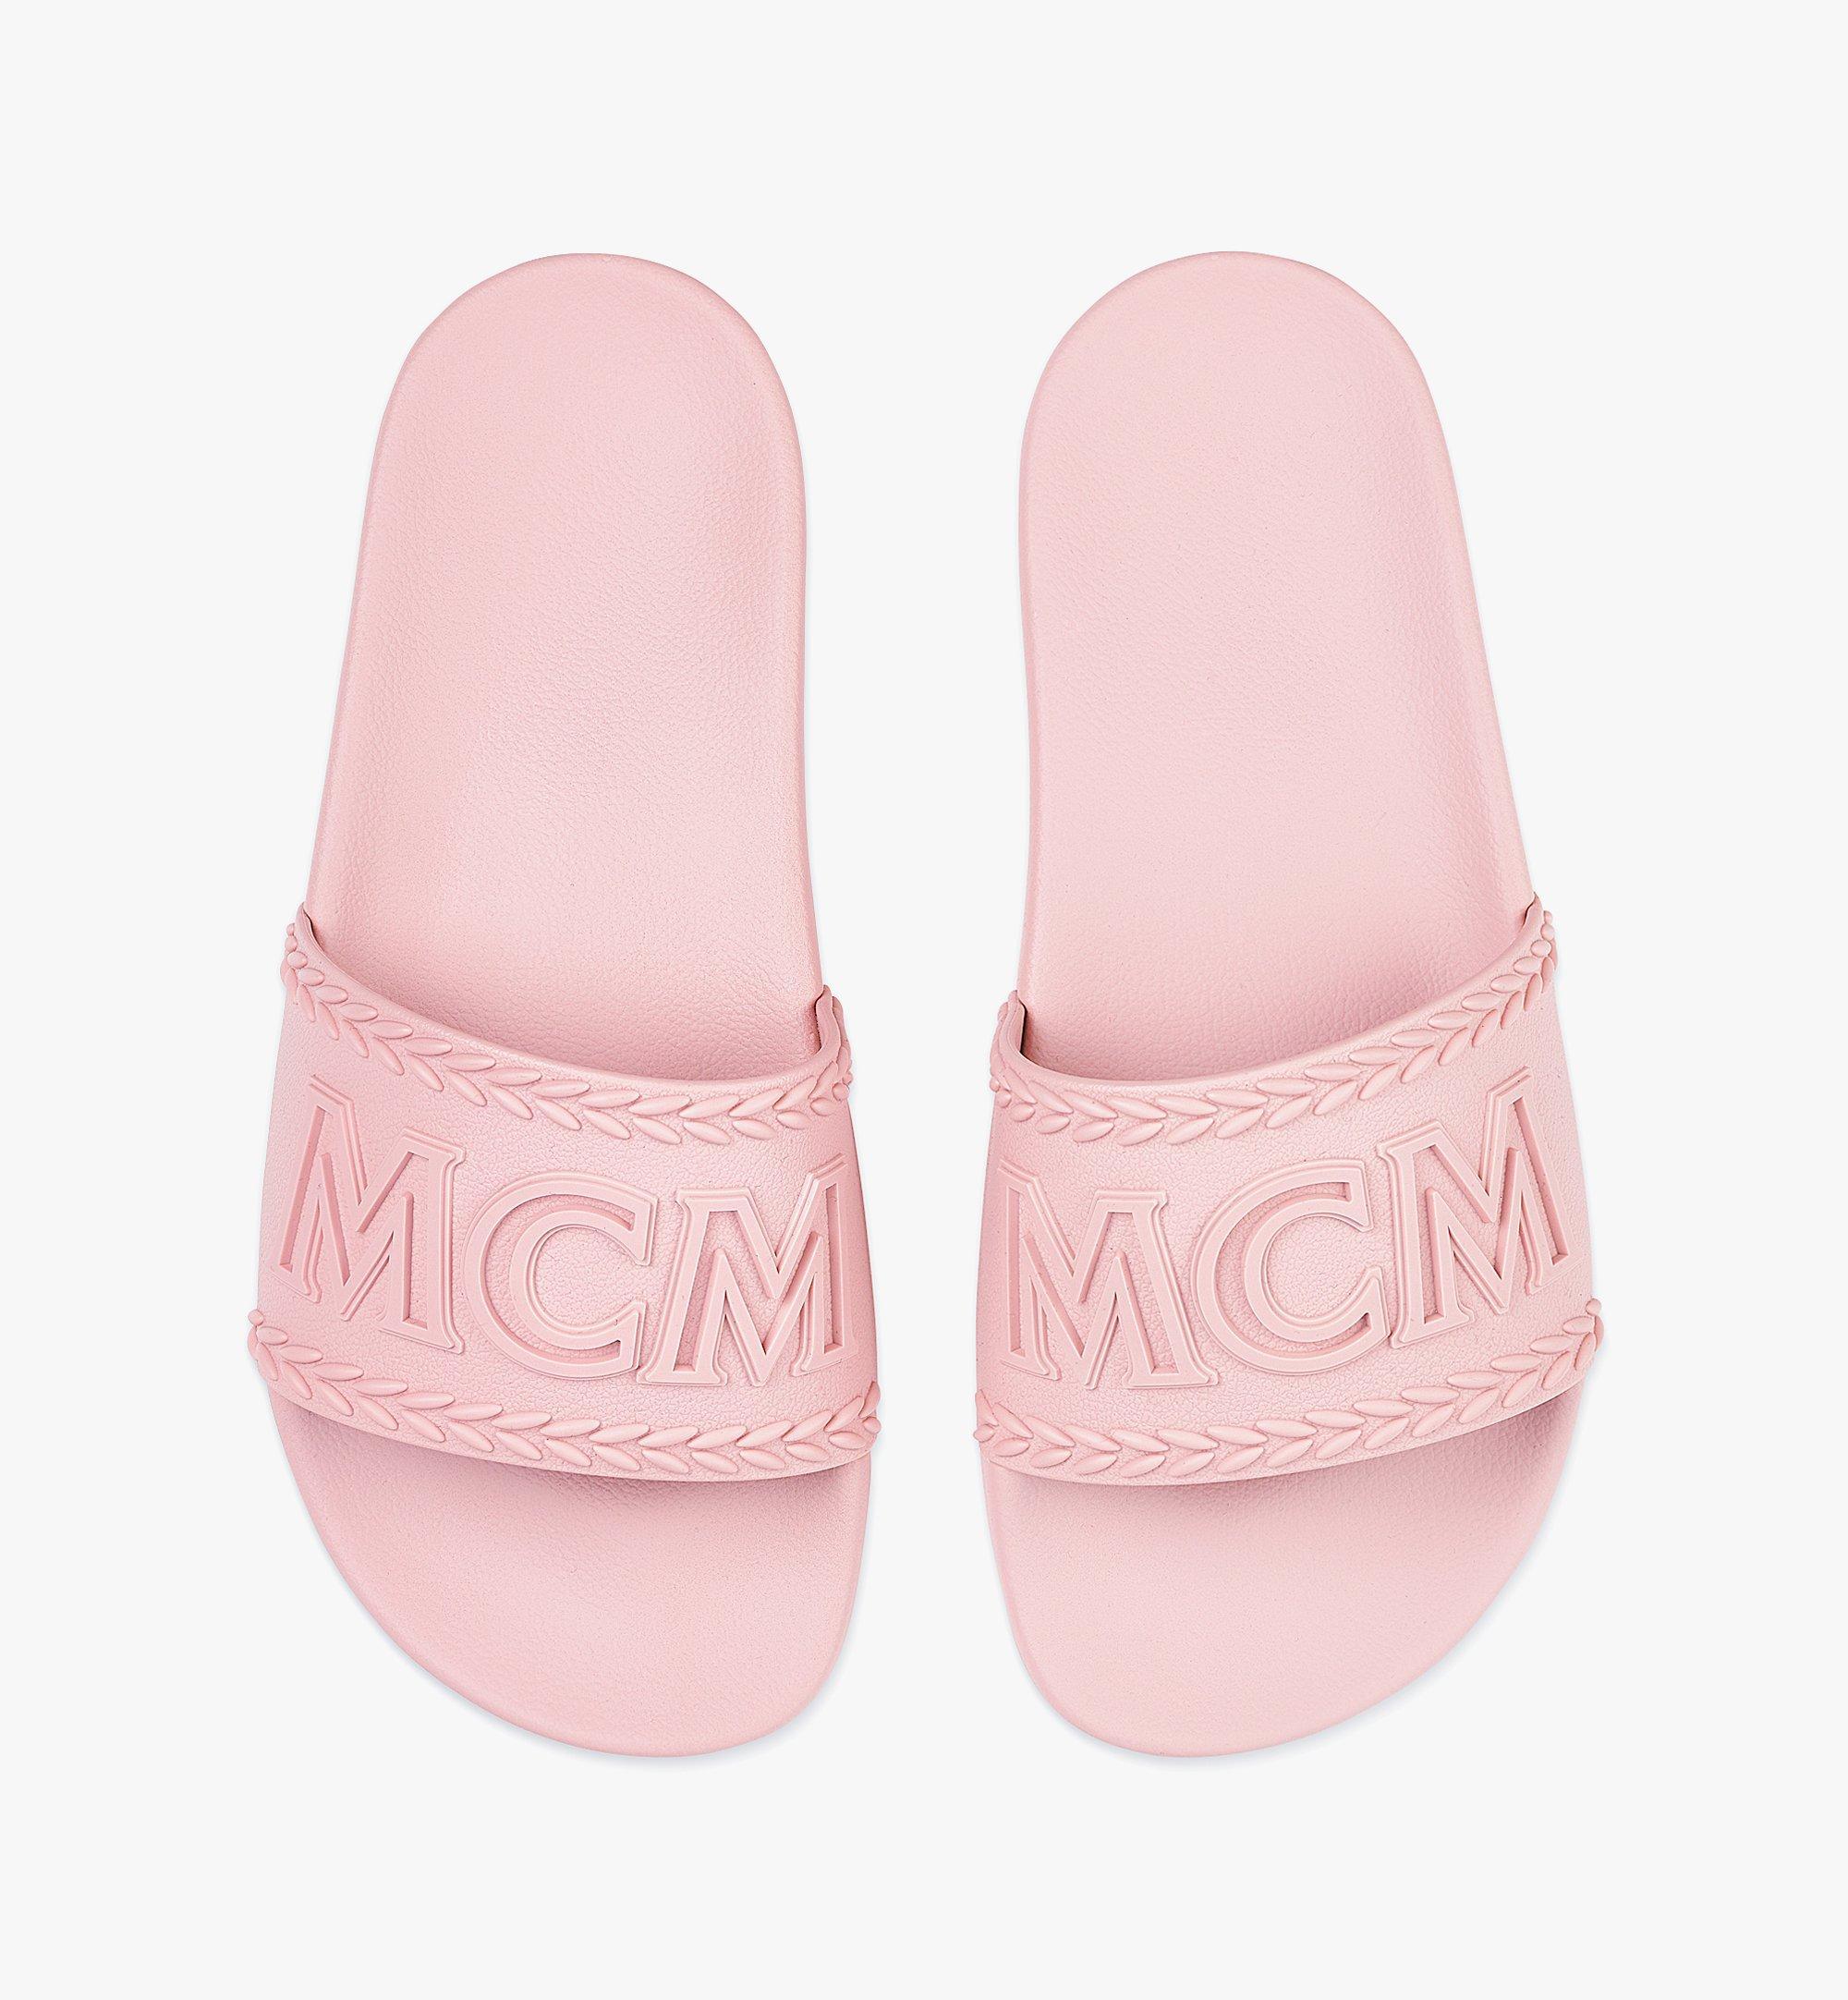 MCM 女士Big Logo橡胶拖鞋 Pink MESBSMM15QH035 更多视角 4